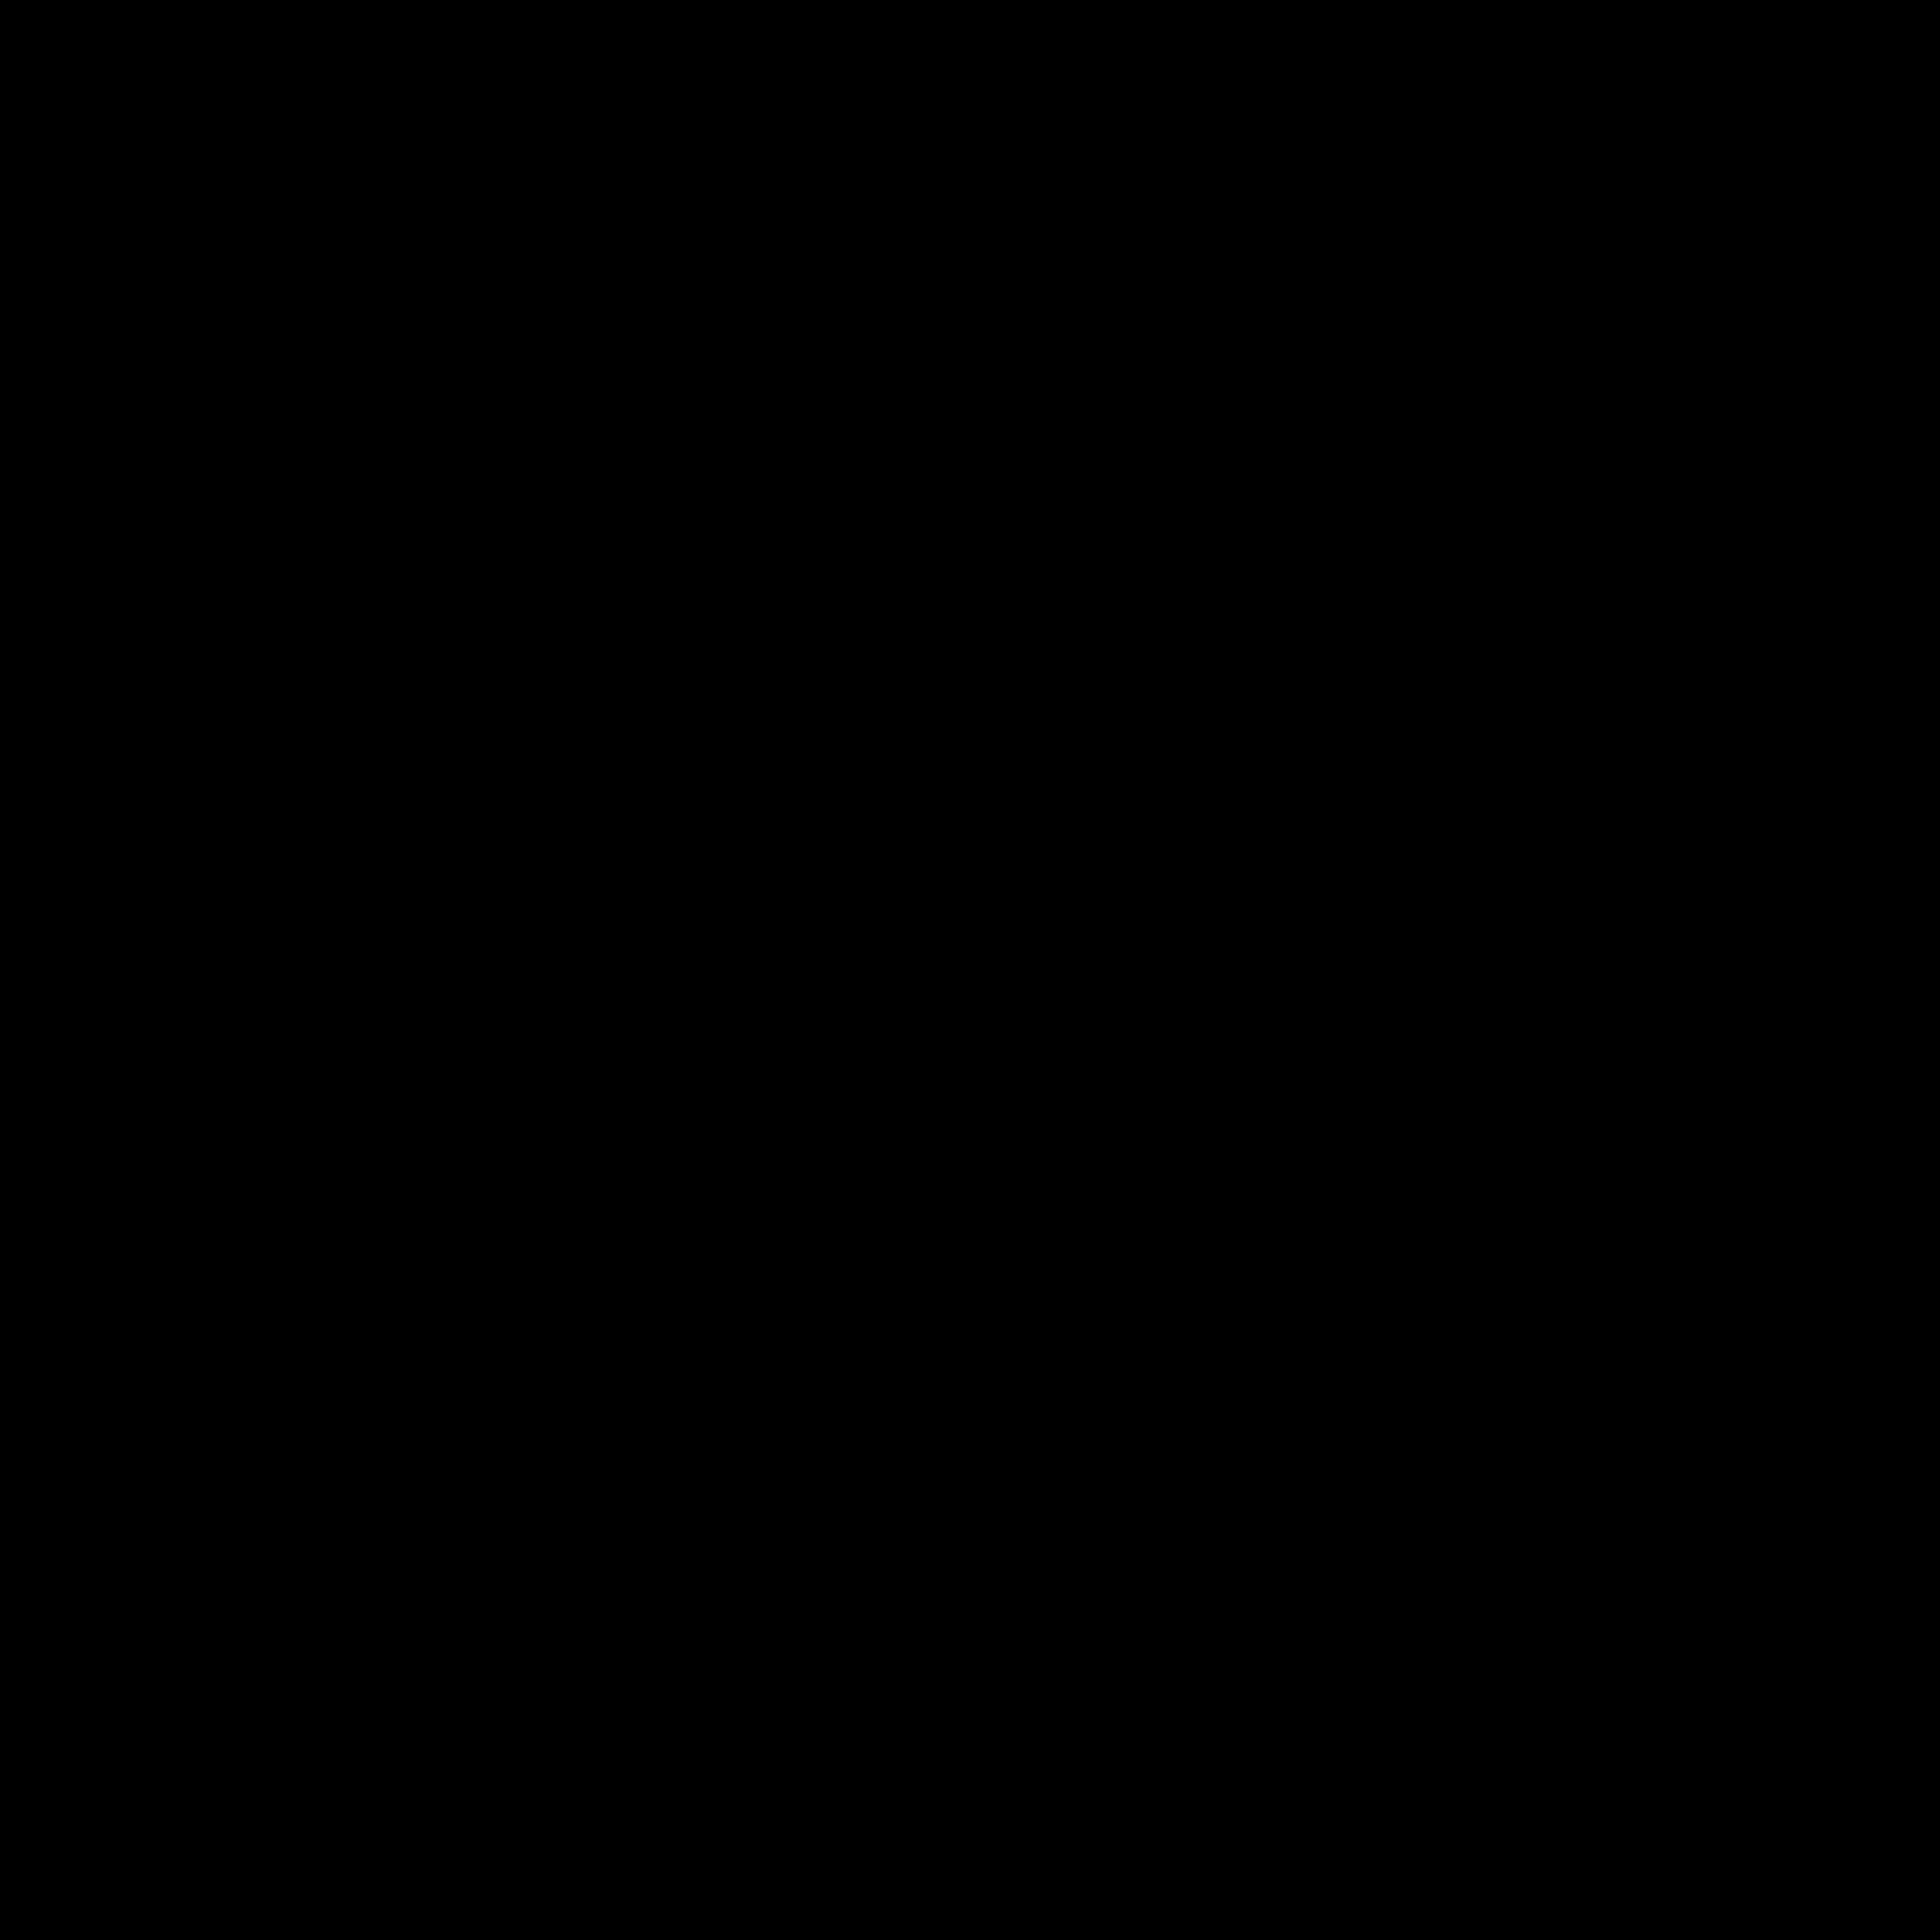 air-canada-1-logo-png-transparent (1).png